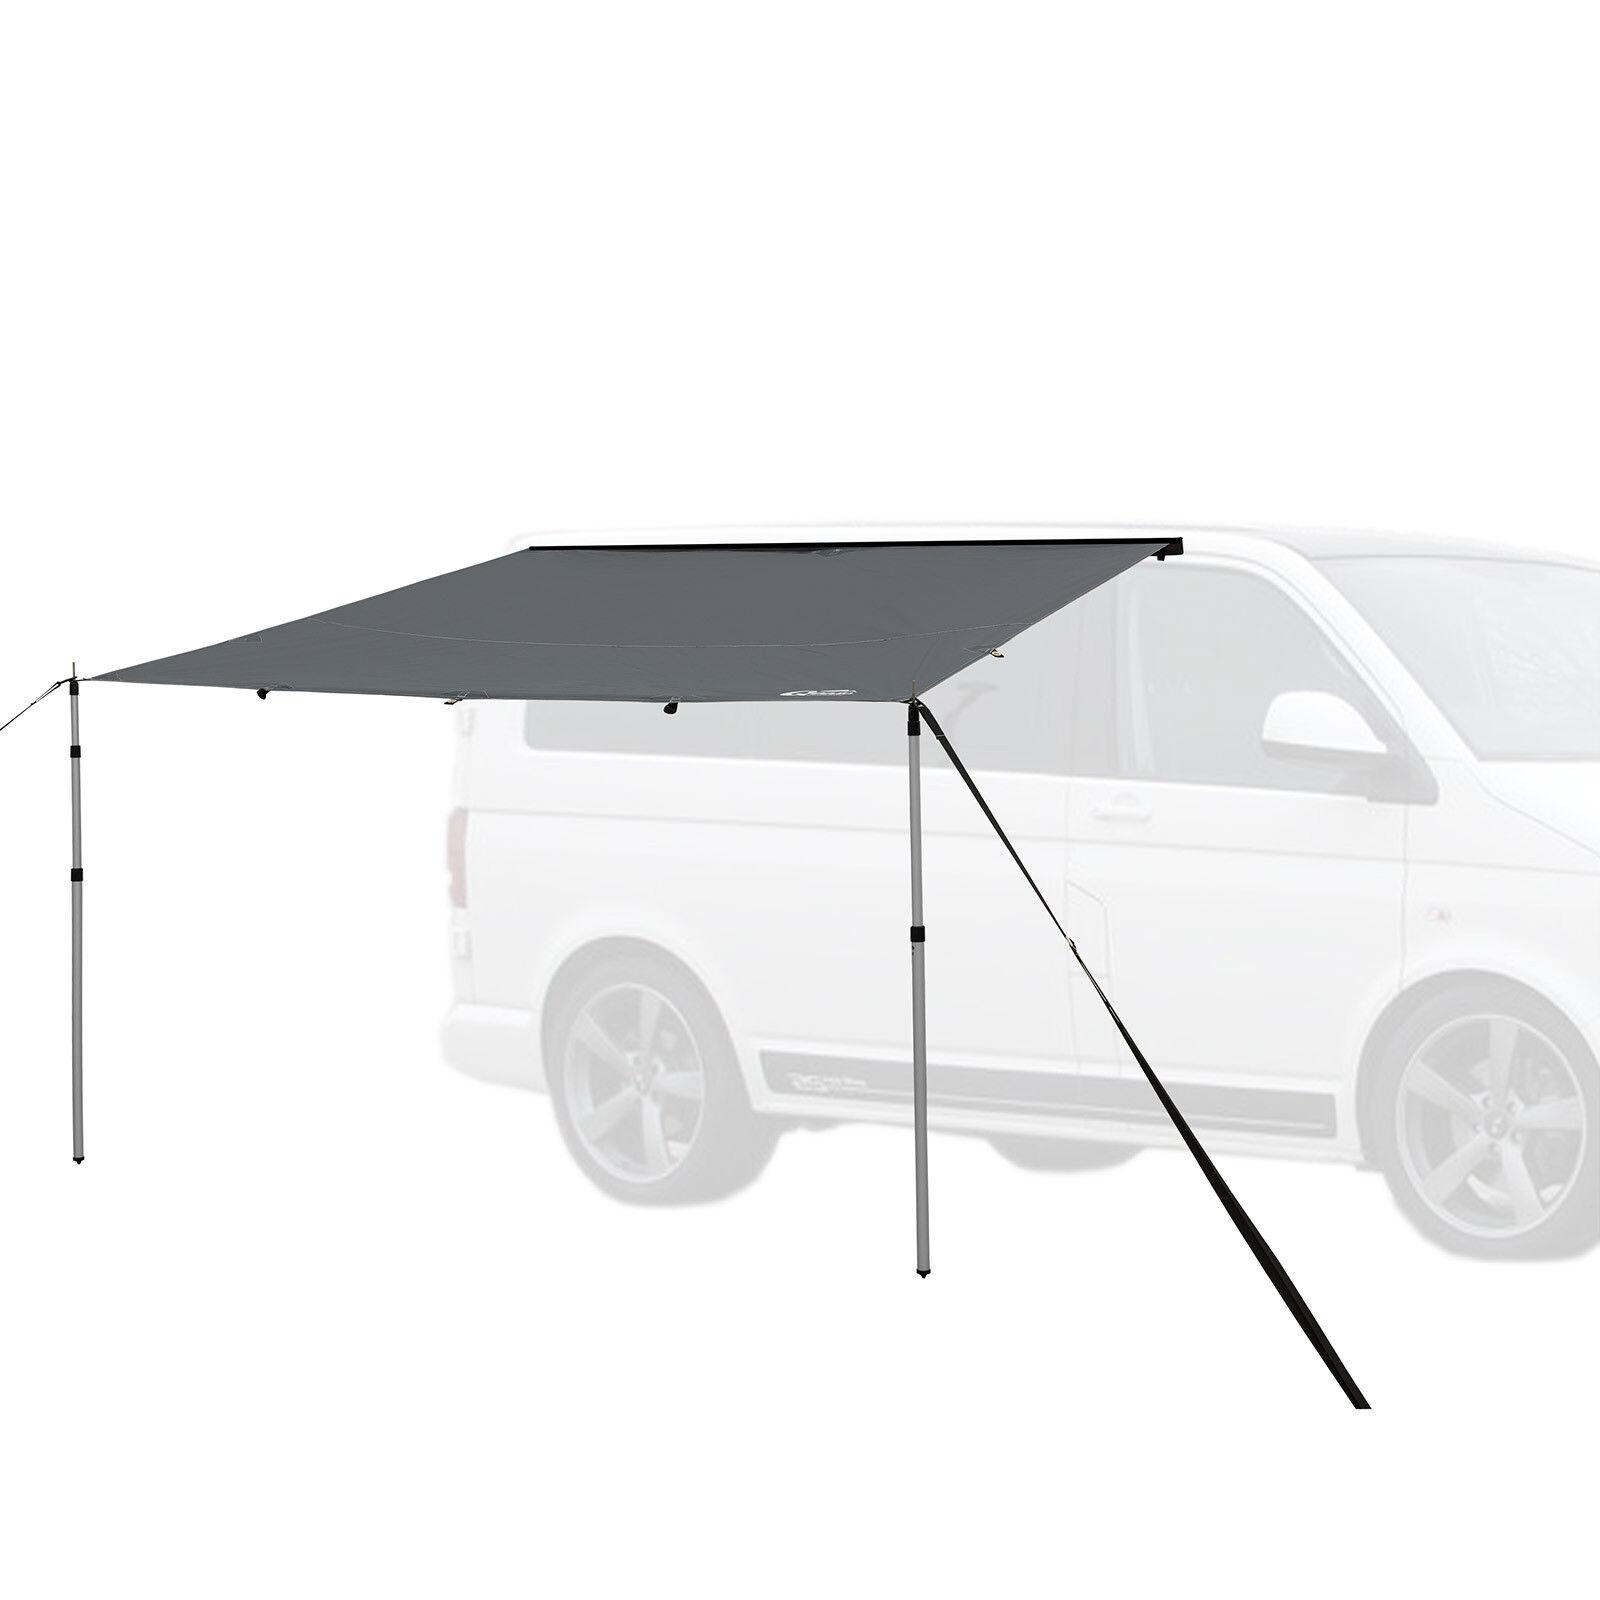 QEEDO Motor Tarp Campingbus Sonnensegel Camper Vorzelt 2 5x2 5m Wasserdicht